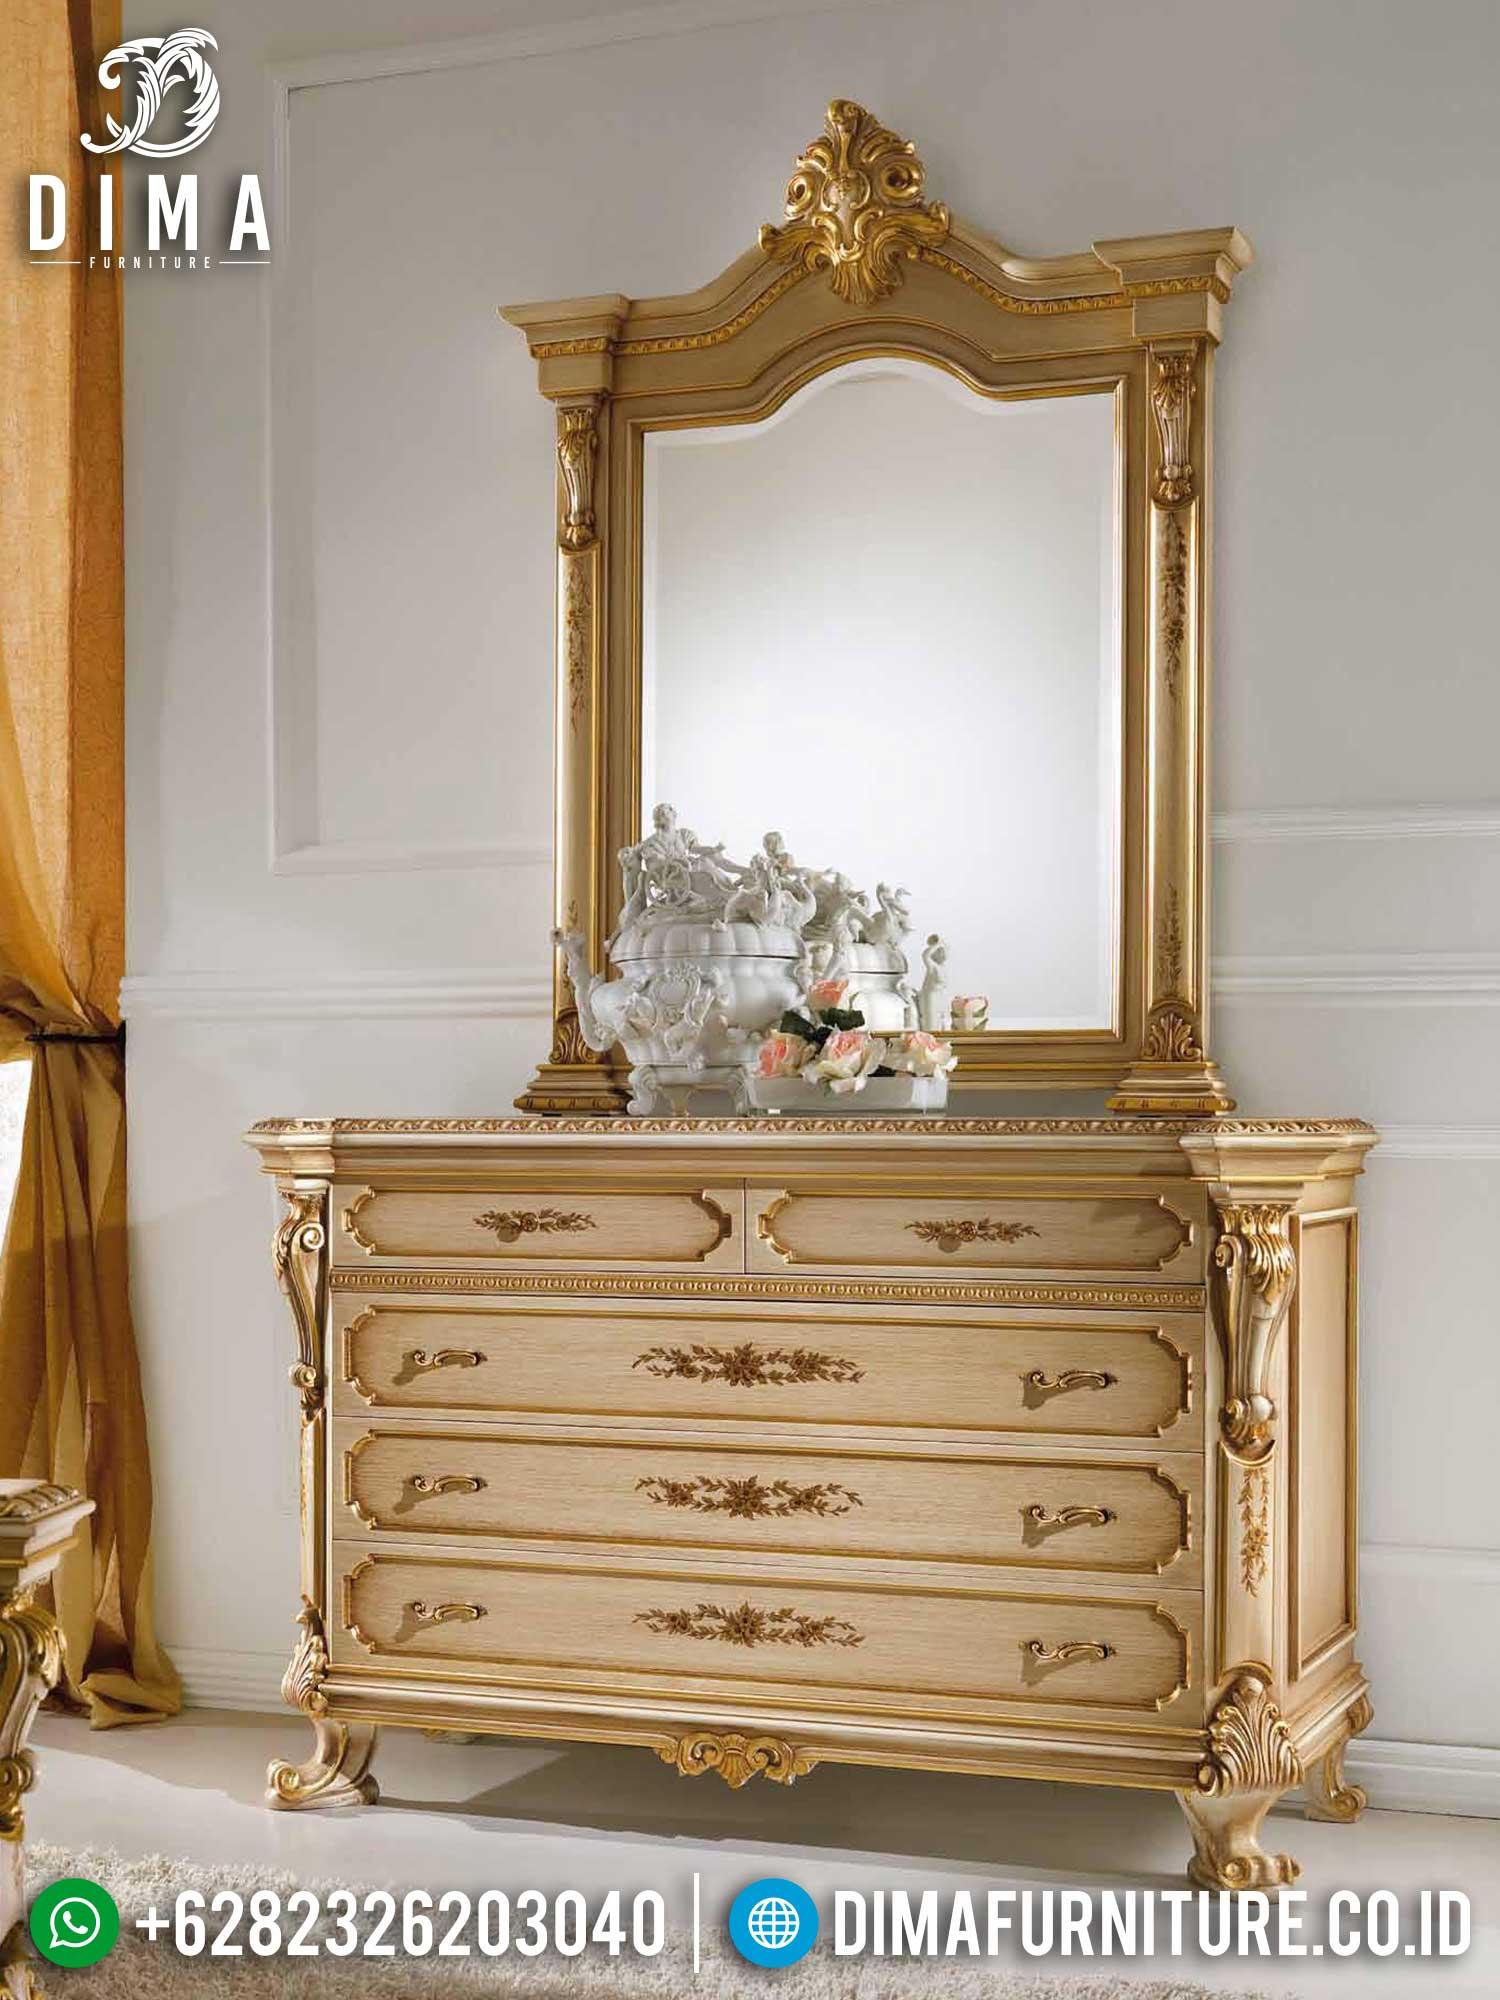 Cermin Hias Mewah, Meja Konsol Ukiran Luxury Premiere Style Furniture Jepara TTJ-1391